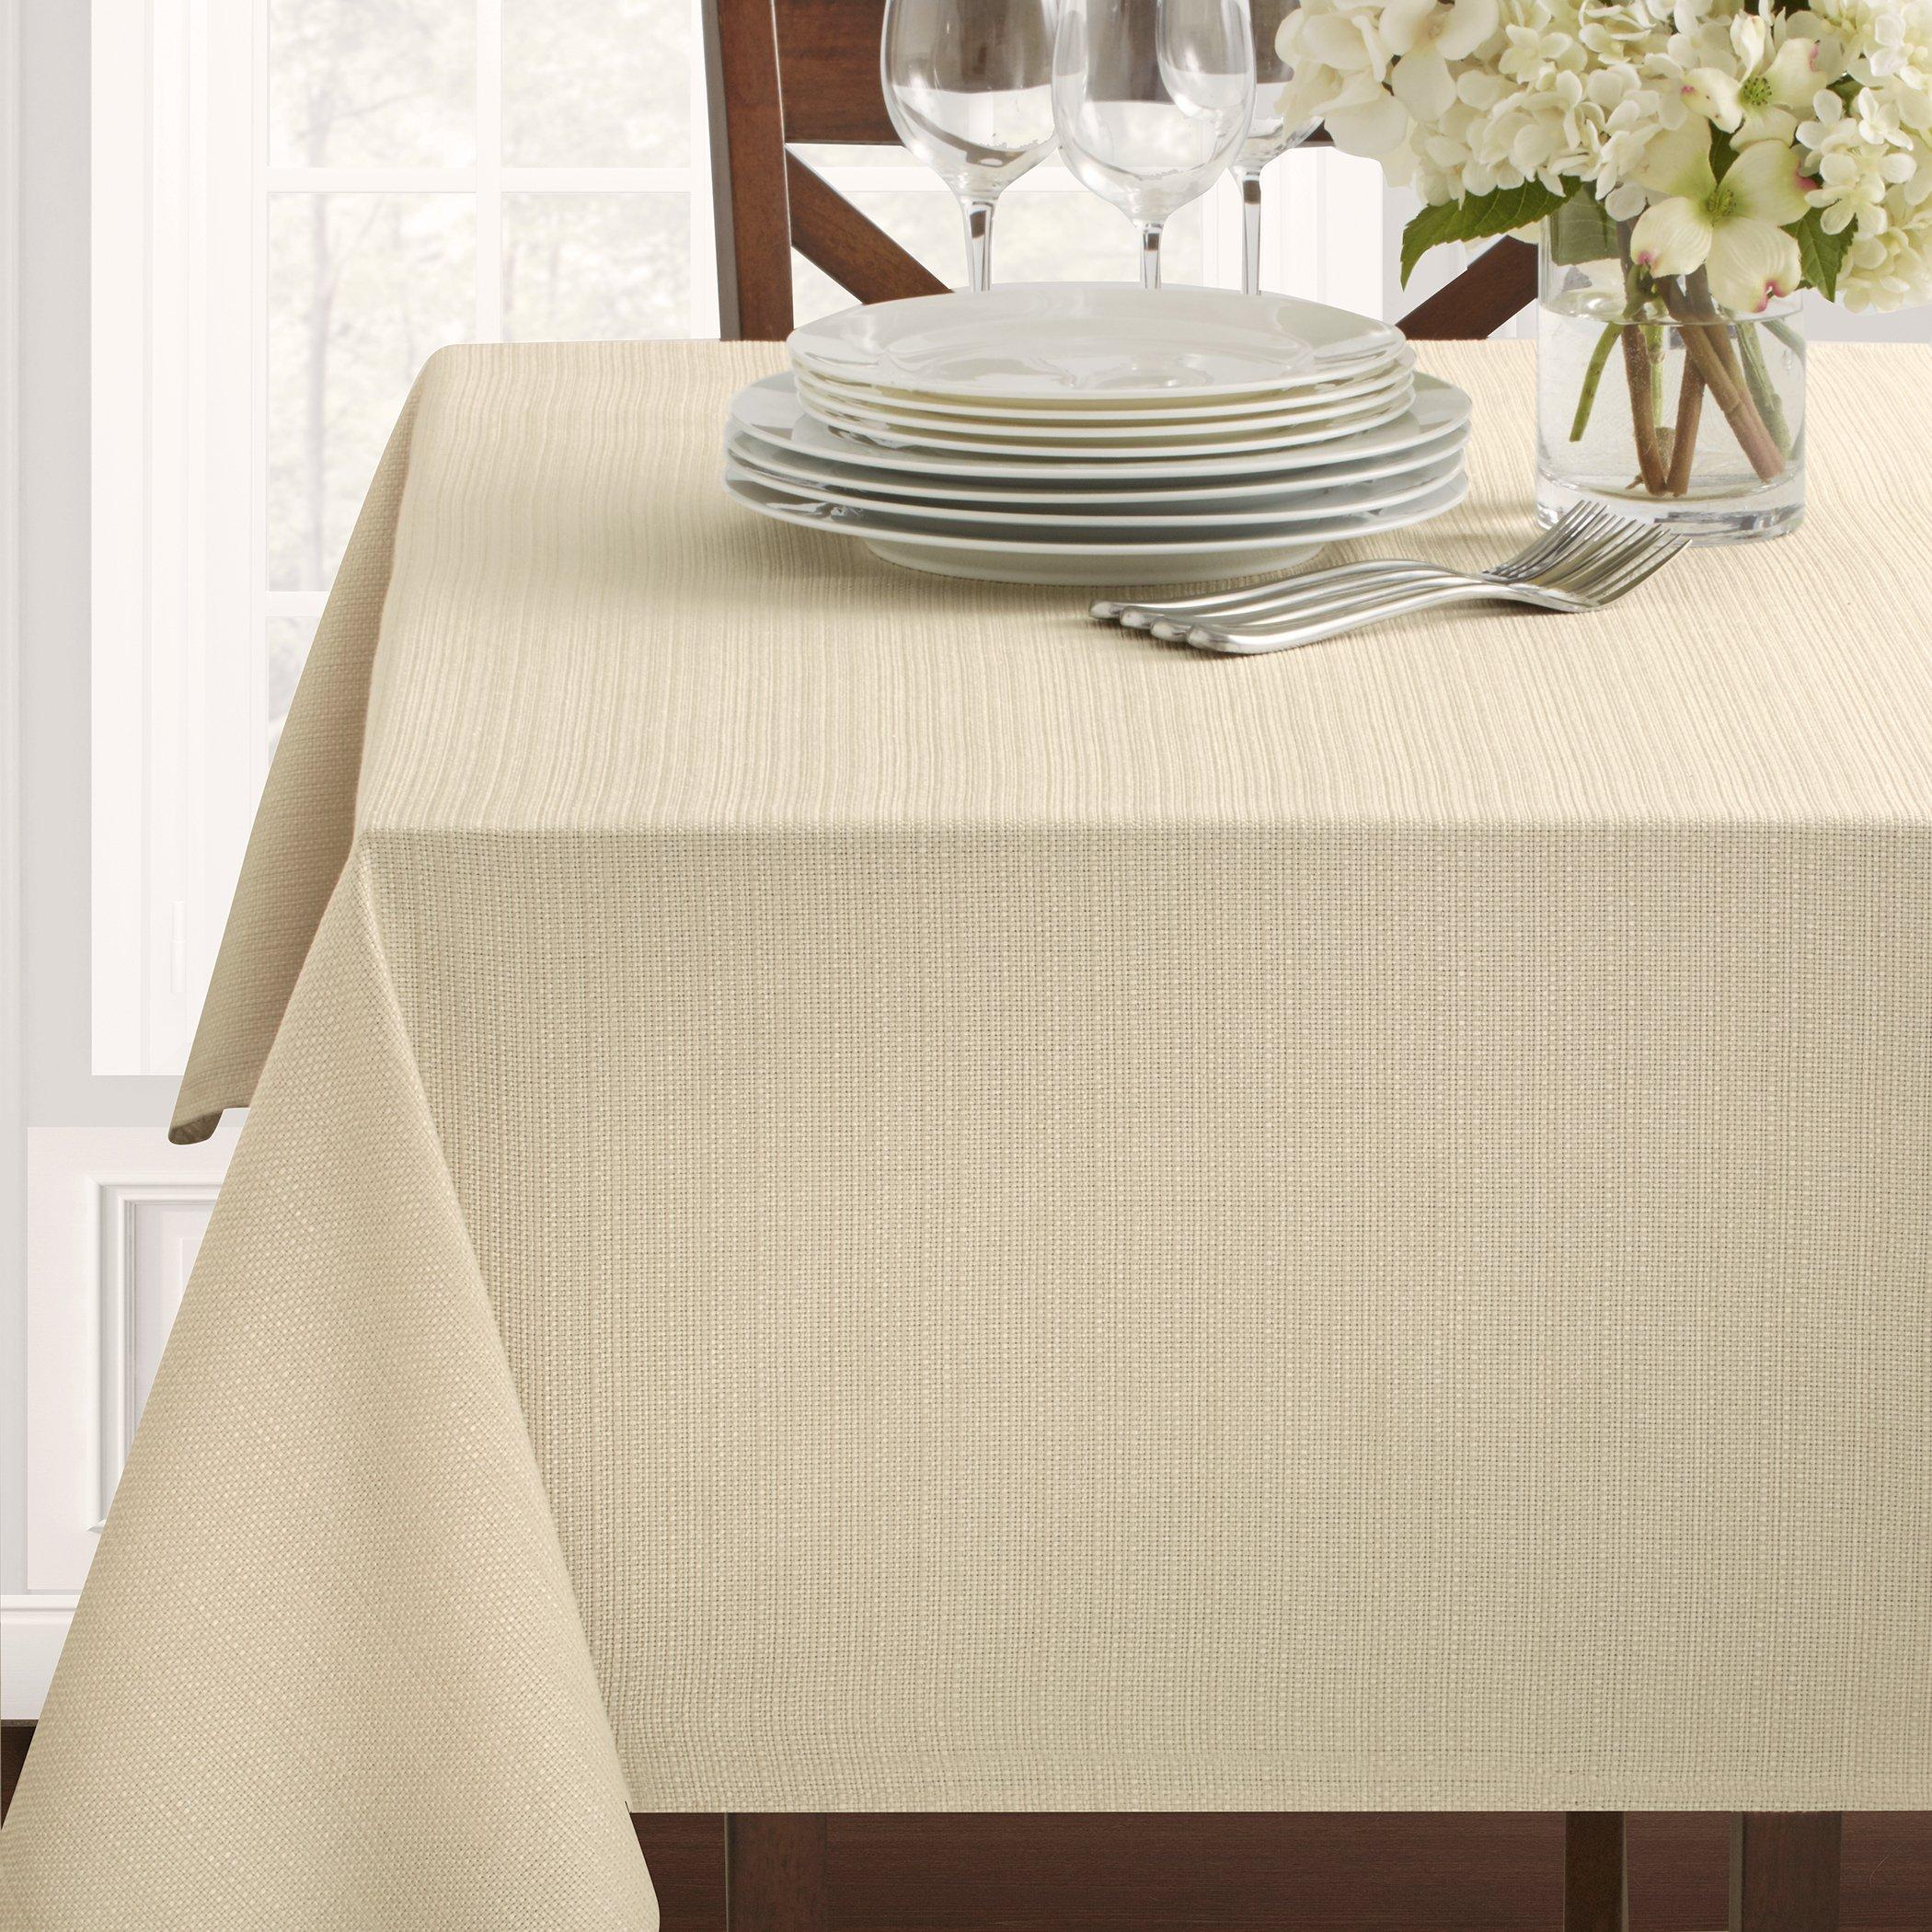 Benson Mills Textured Fabric Tablecloth (60'' x 140'' Rectangular, Flax)